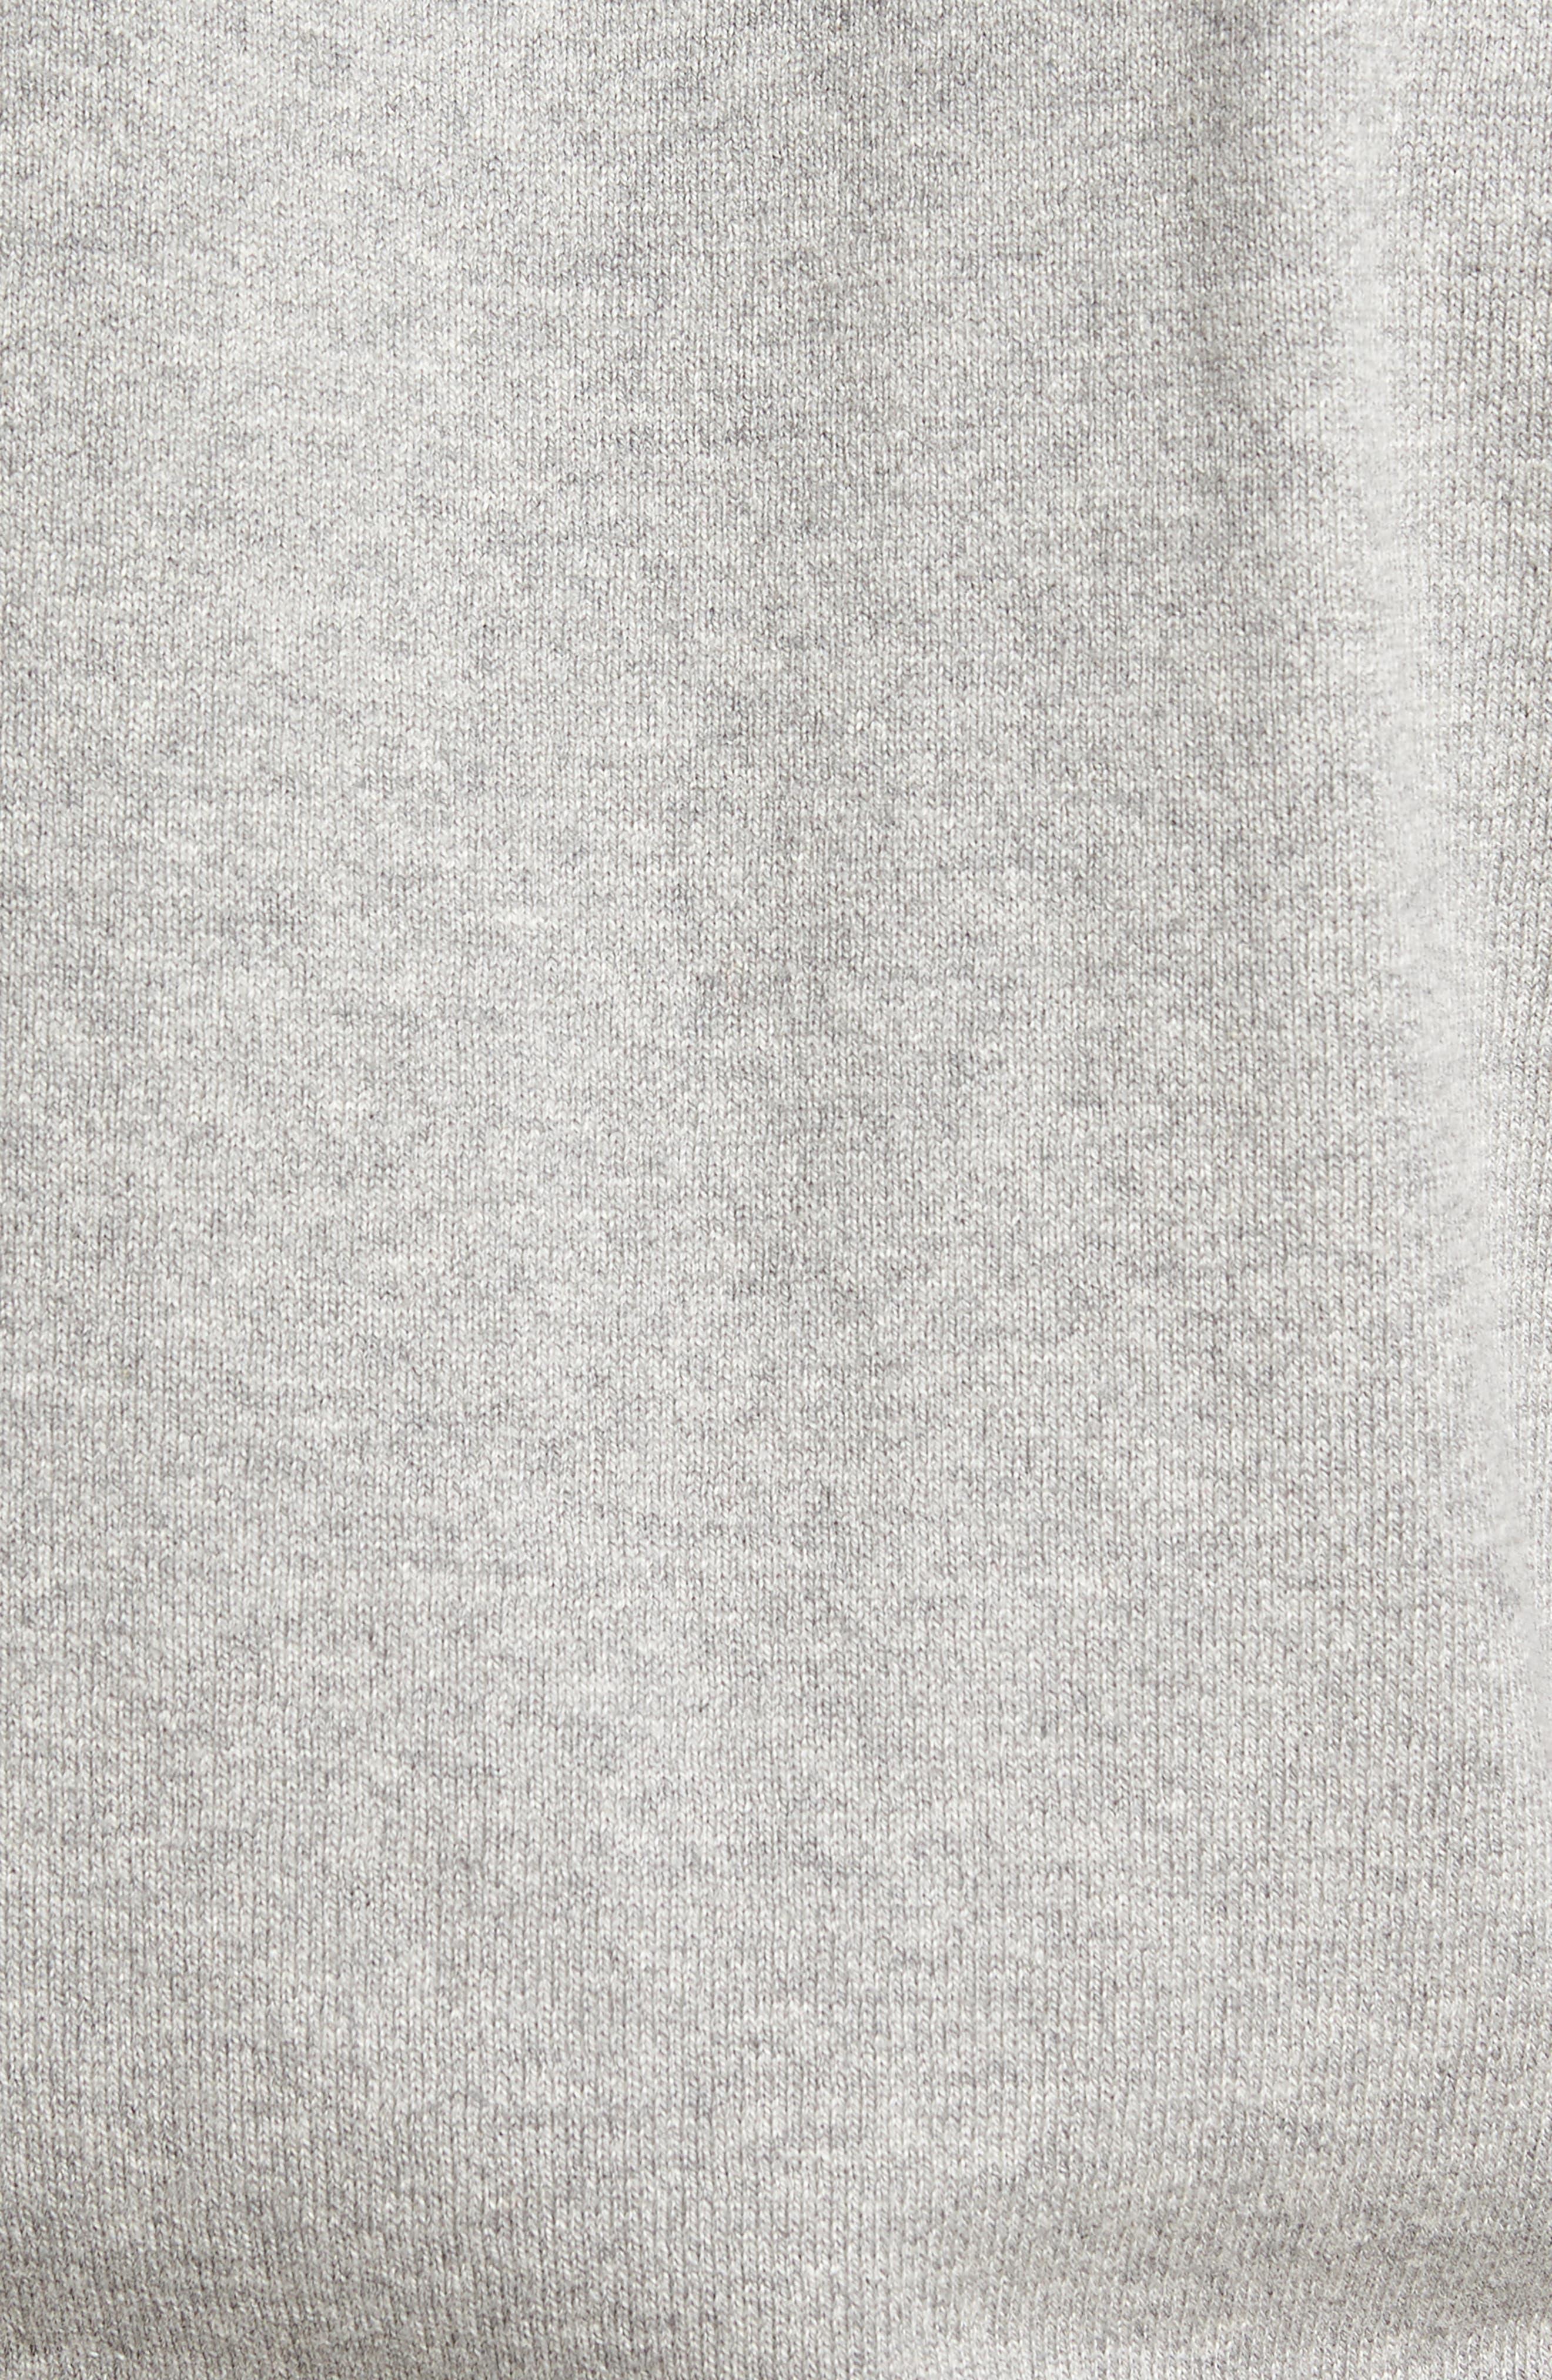 Saddle Shoulder Cotton & Cashmere Sweater,                             Alternate thumbnail 5, color,                             Grey Heather